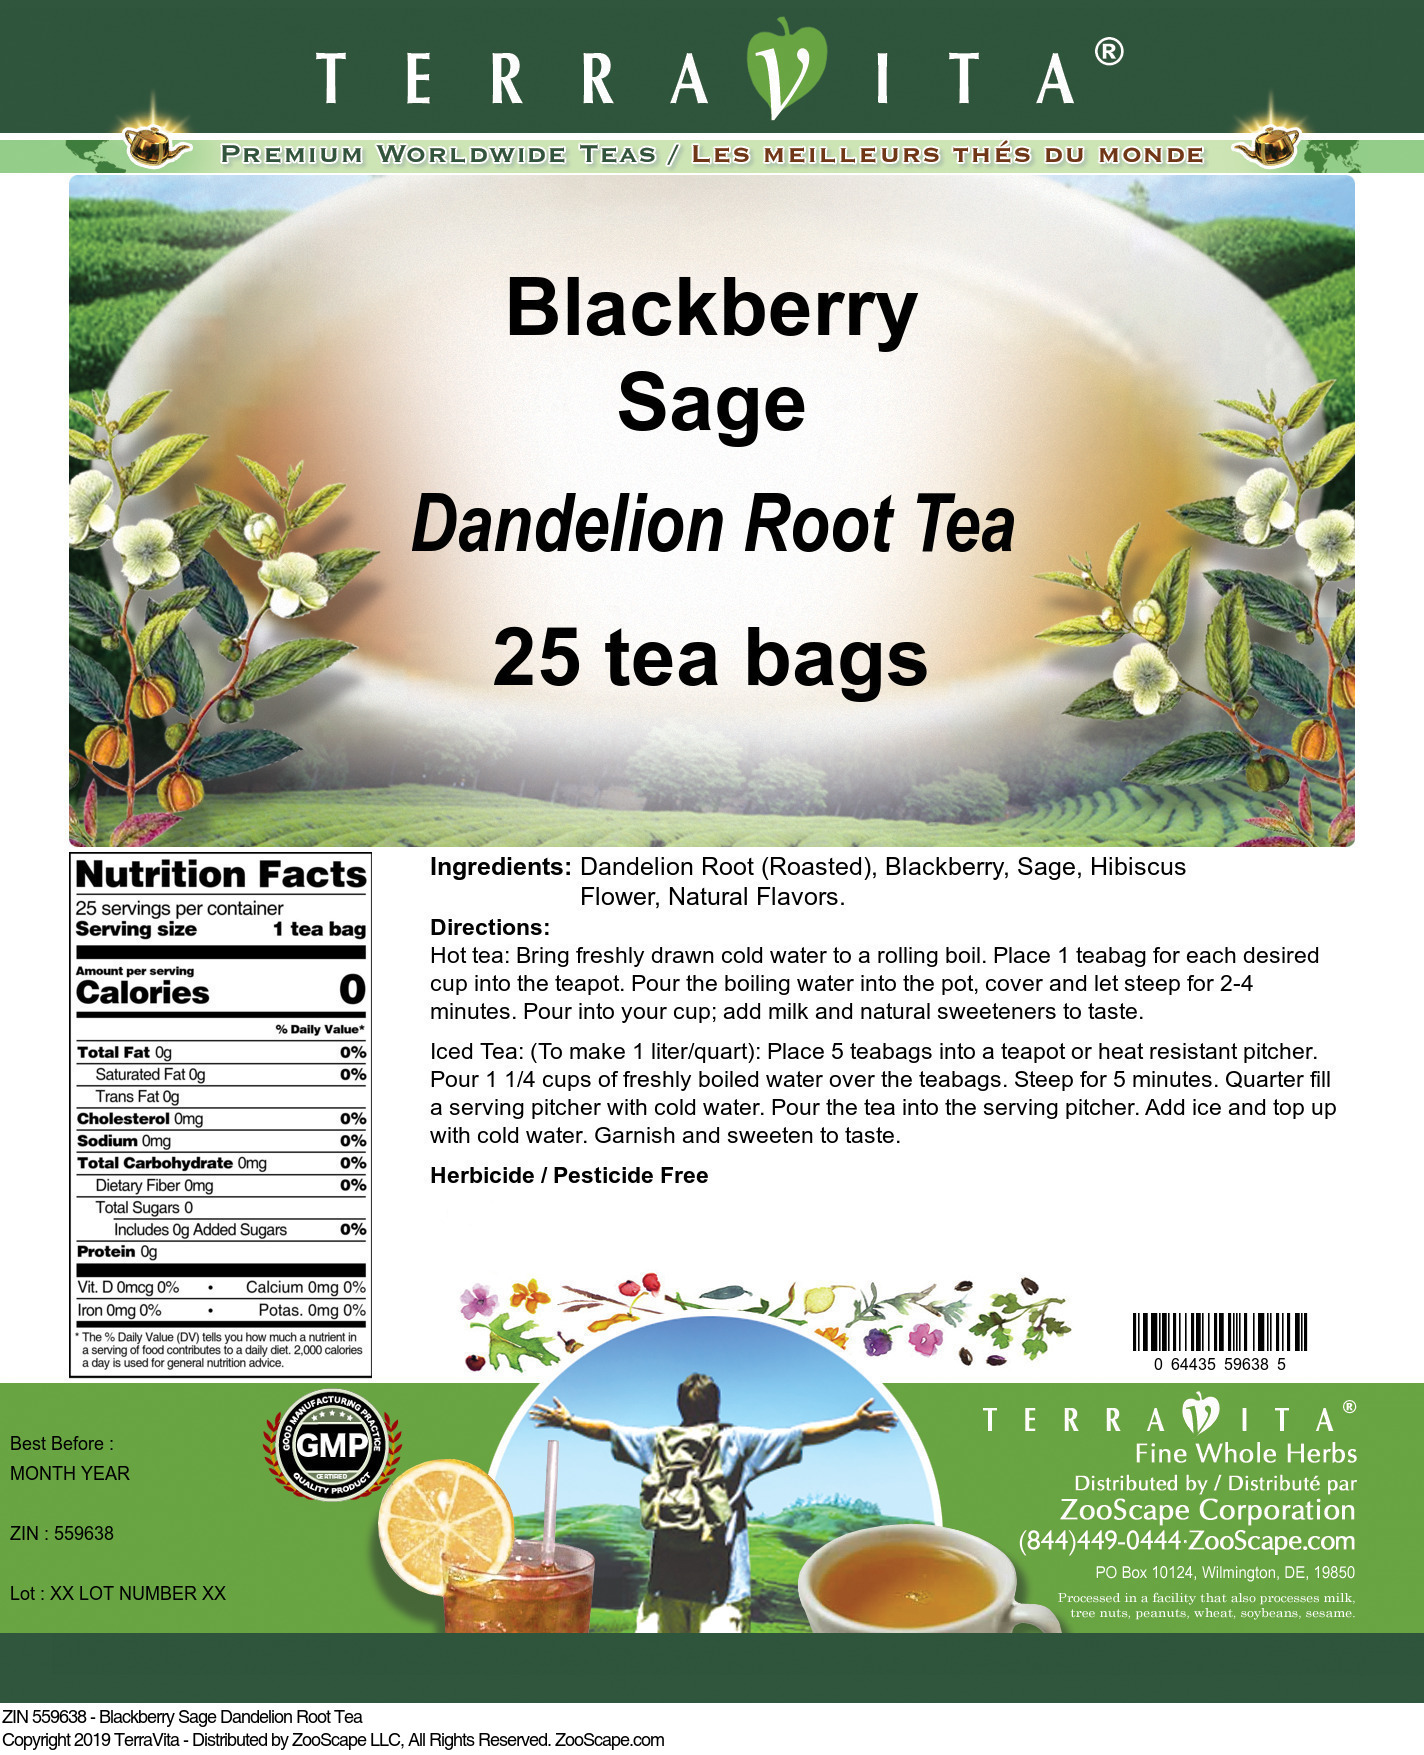 Blackberry Sage Dandelion Root